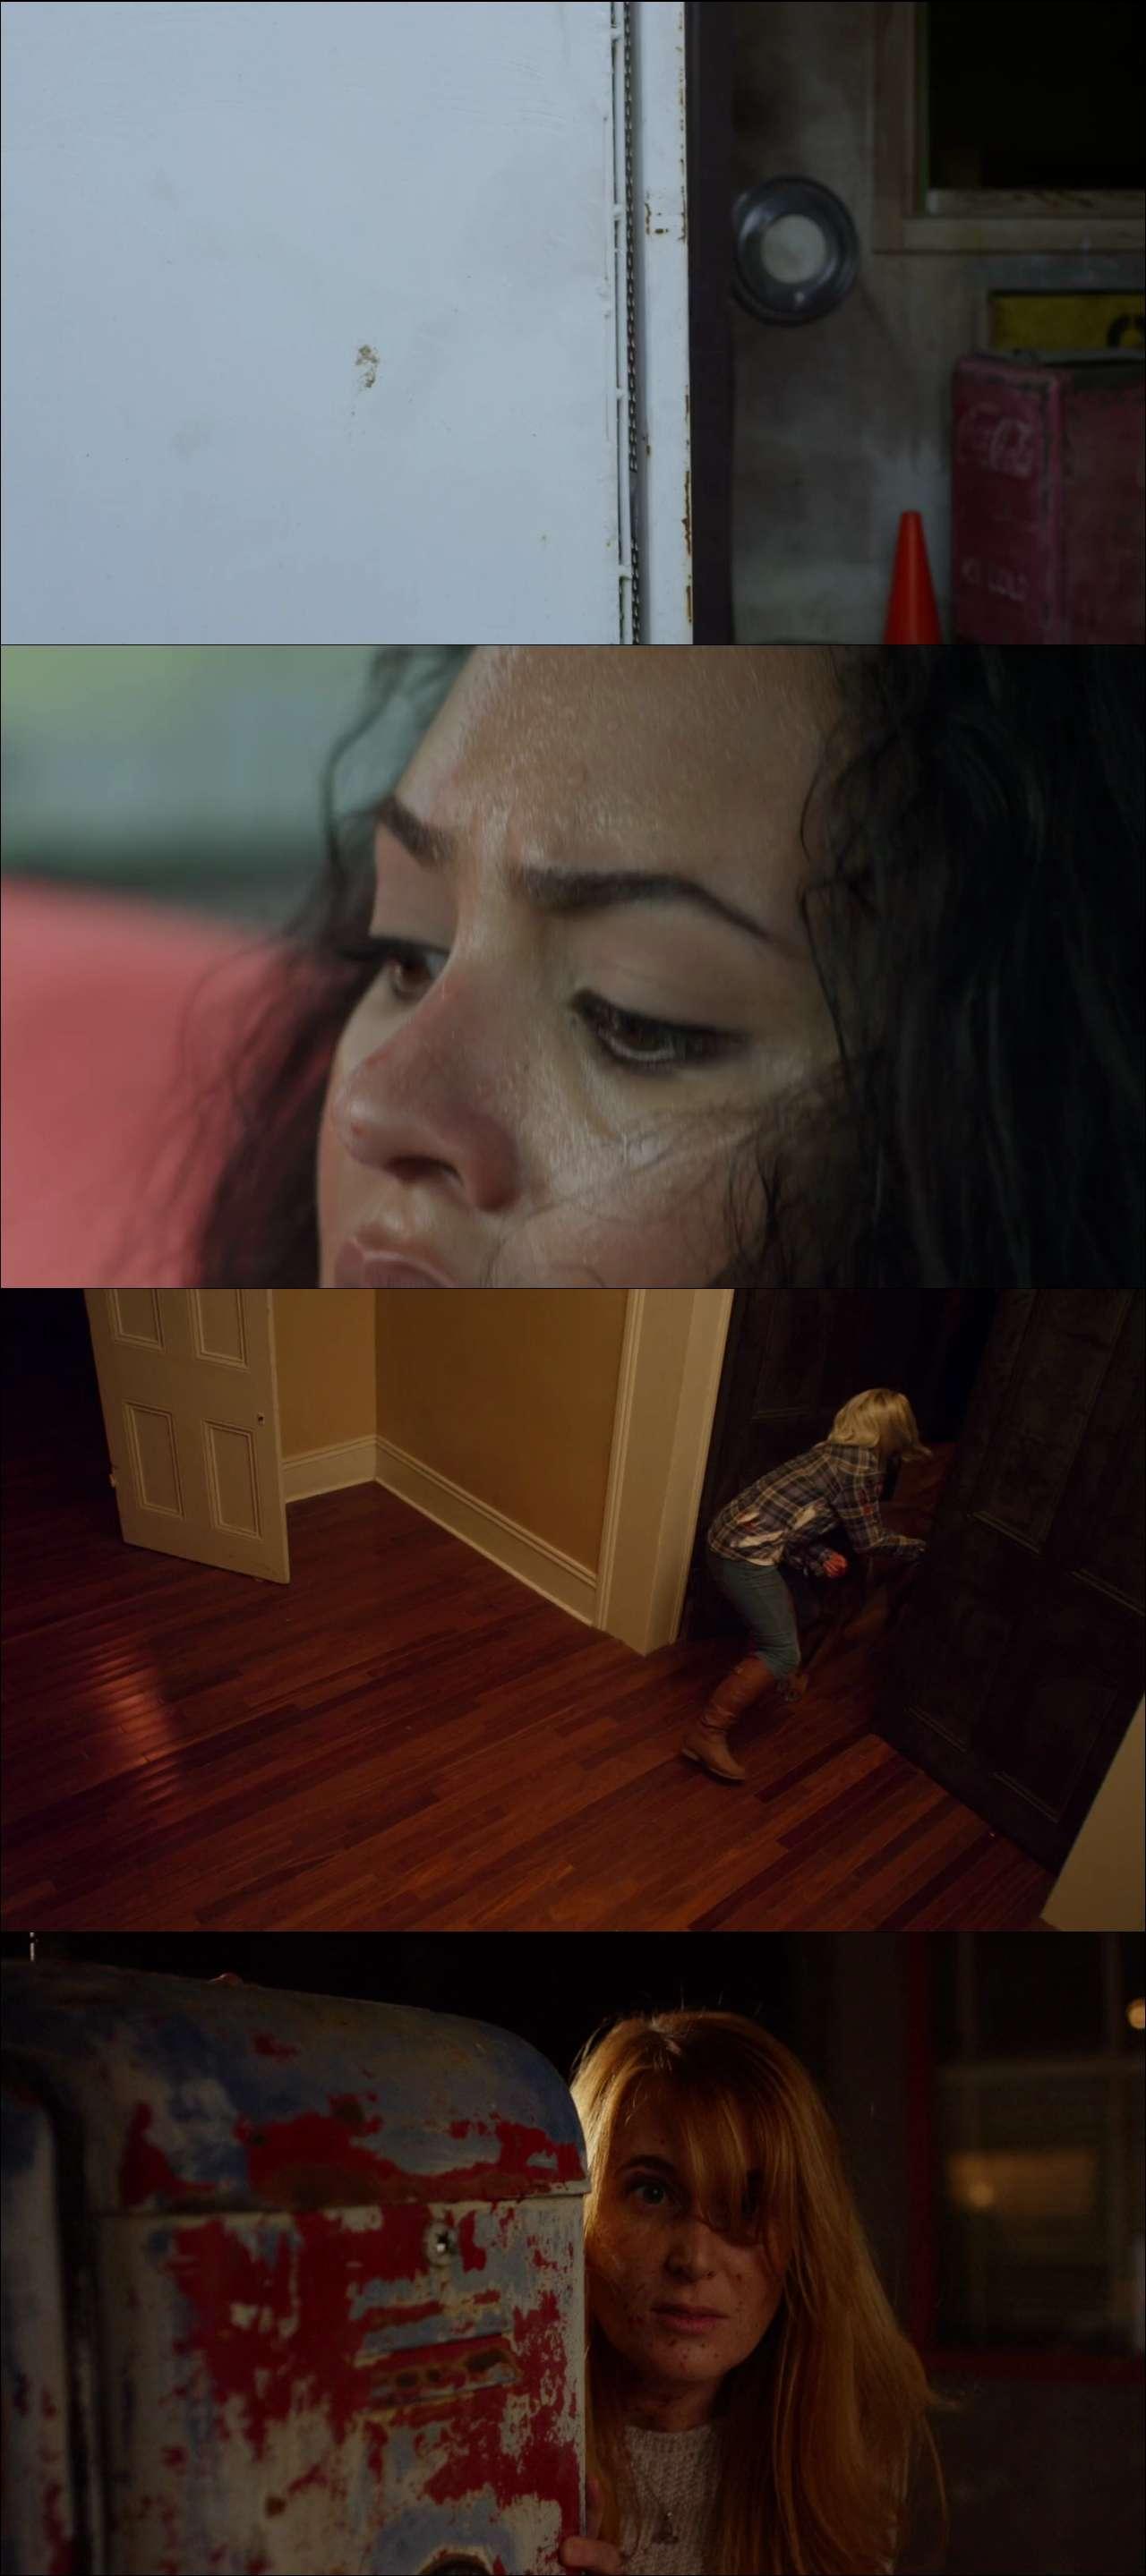 Night of the Wild (2015) türkçe dublaj korku filmi indir